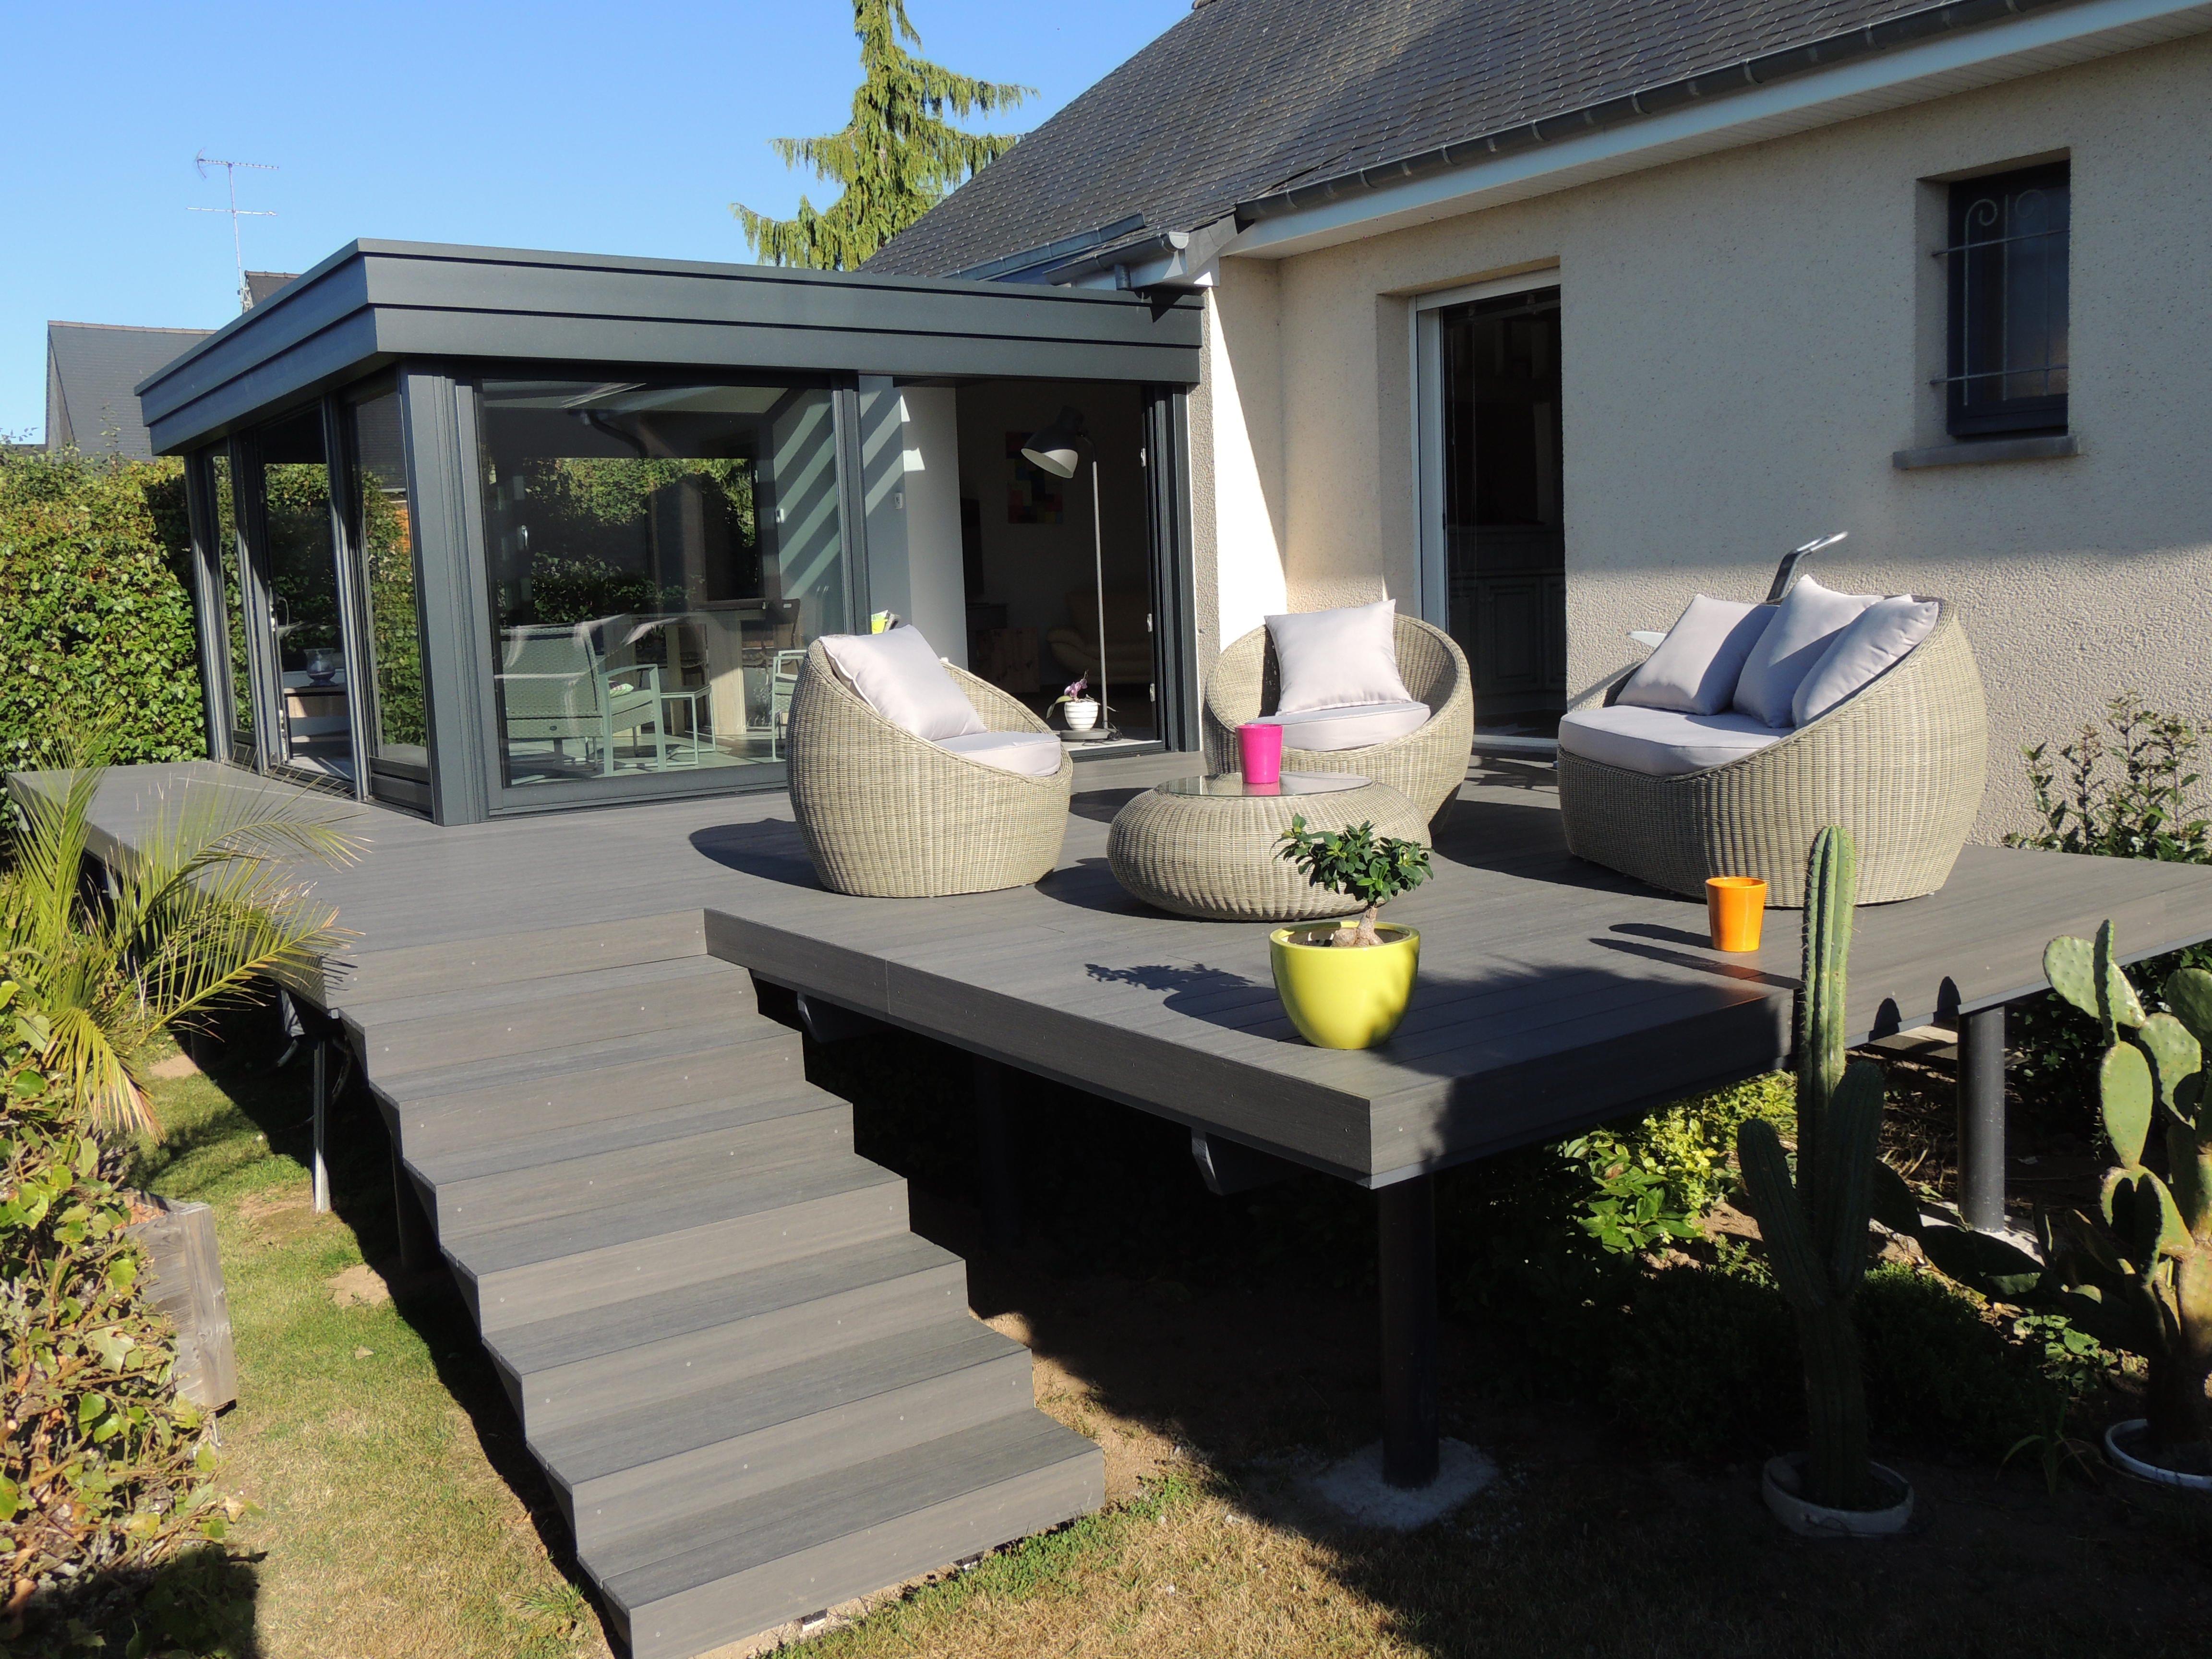 image terrasse bois composite teinte anthracite